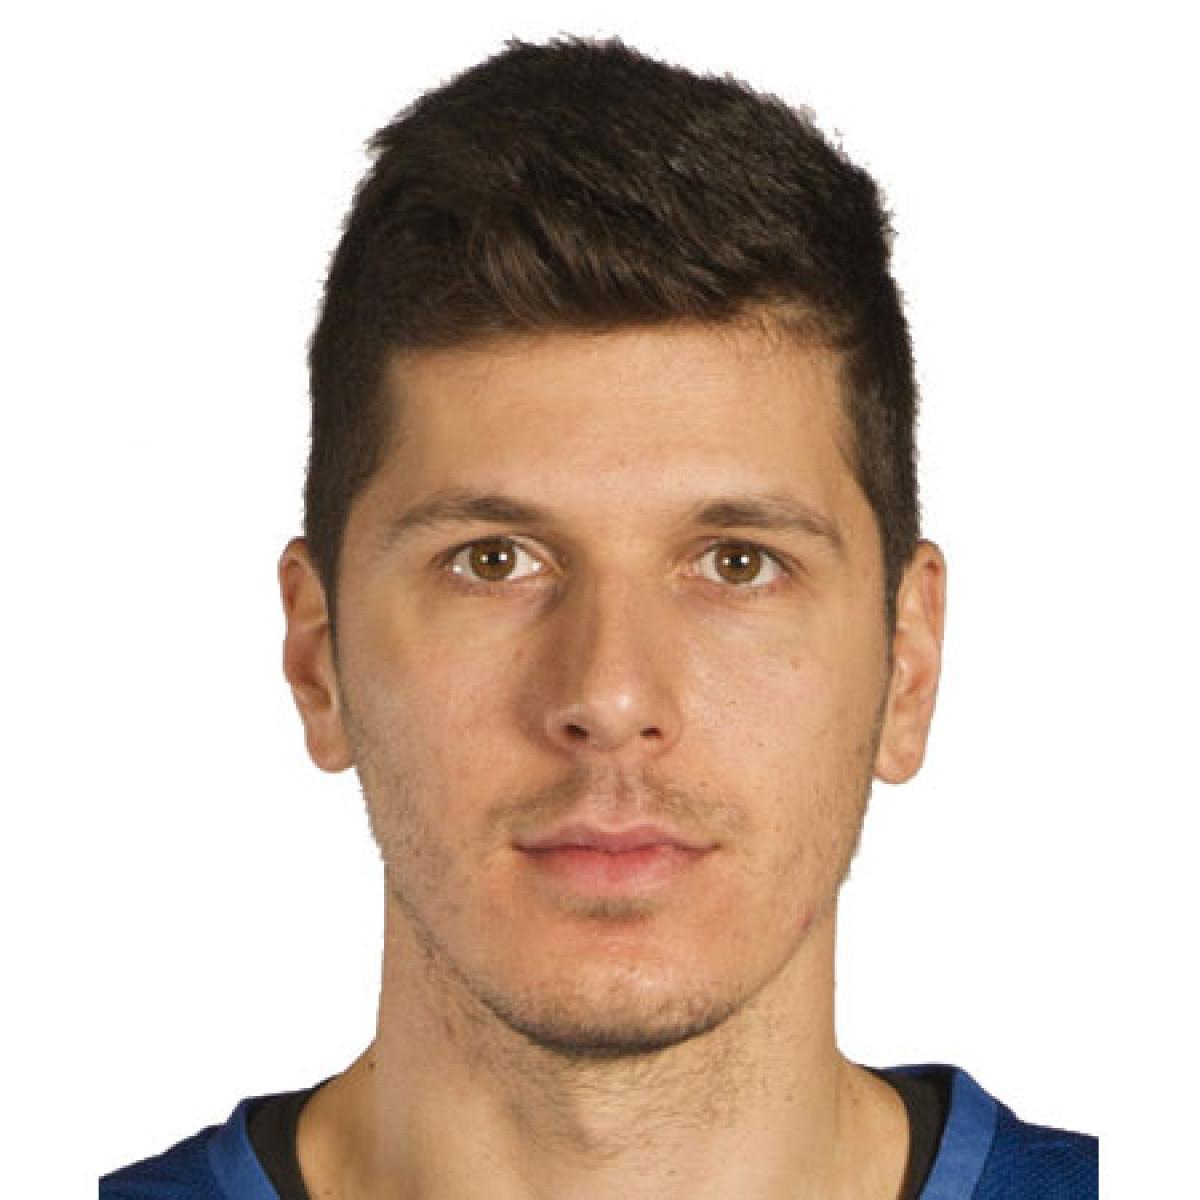 Goran Huskic